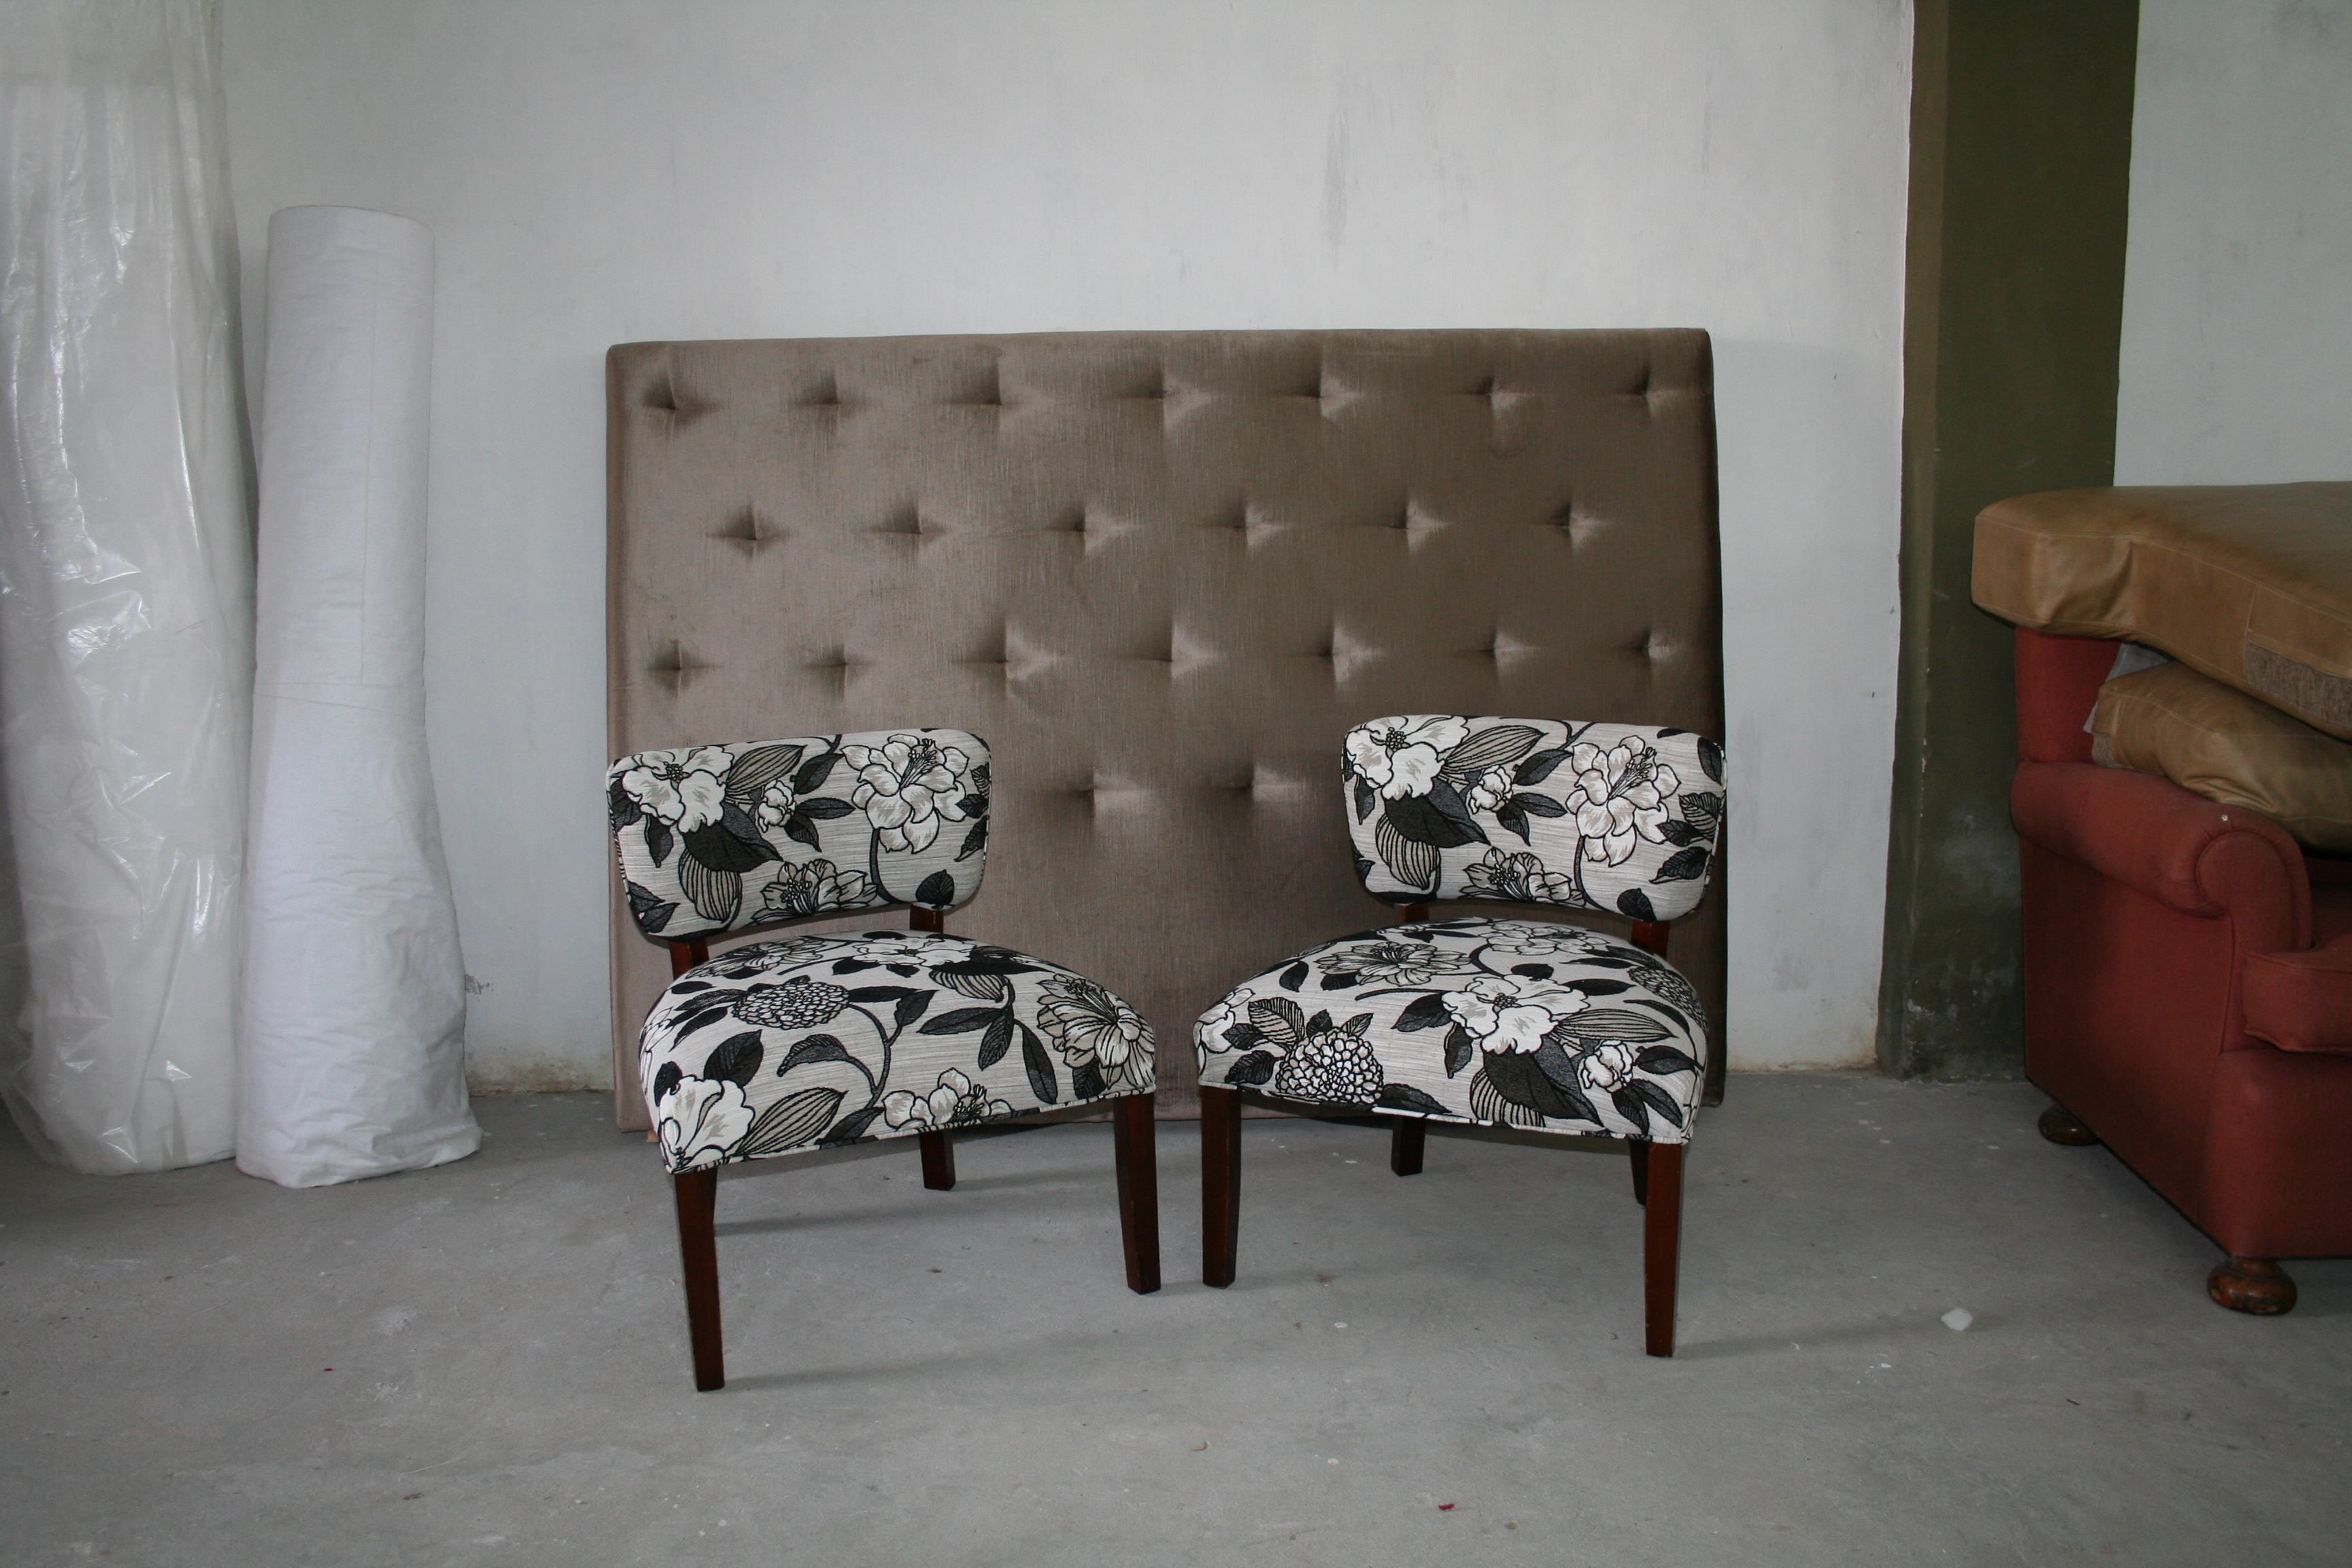 Butaca Matera: asiento con resorte espiral de 4 vueltas cubierto con placa densidad media, patas madera caoba oscuro.